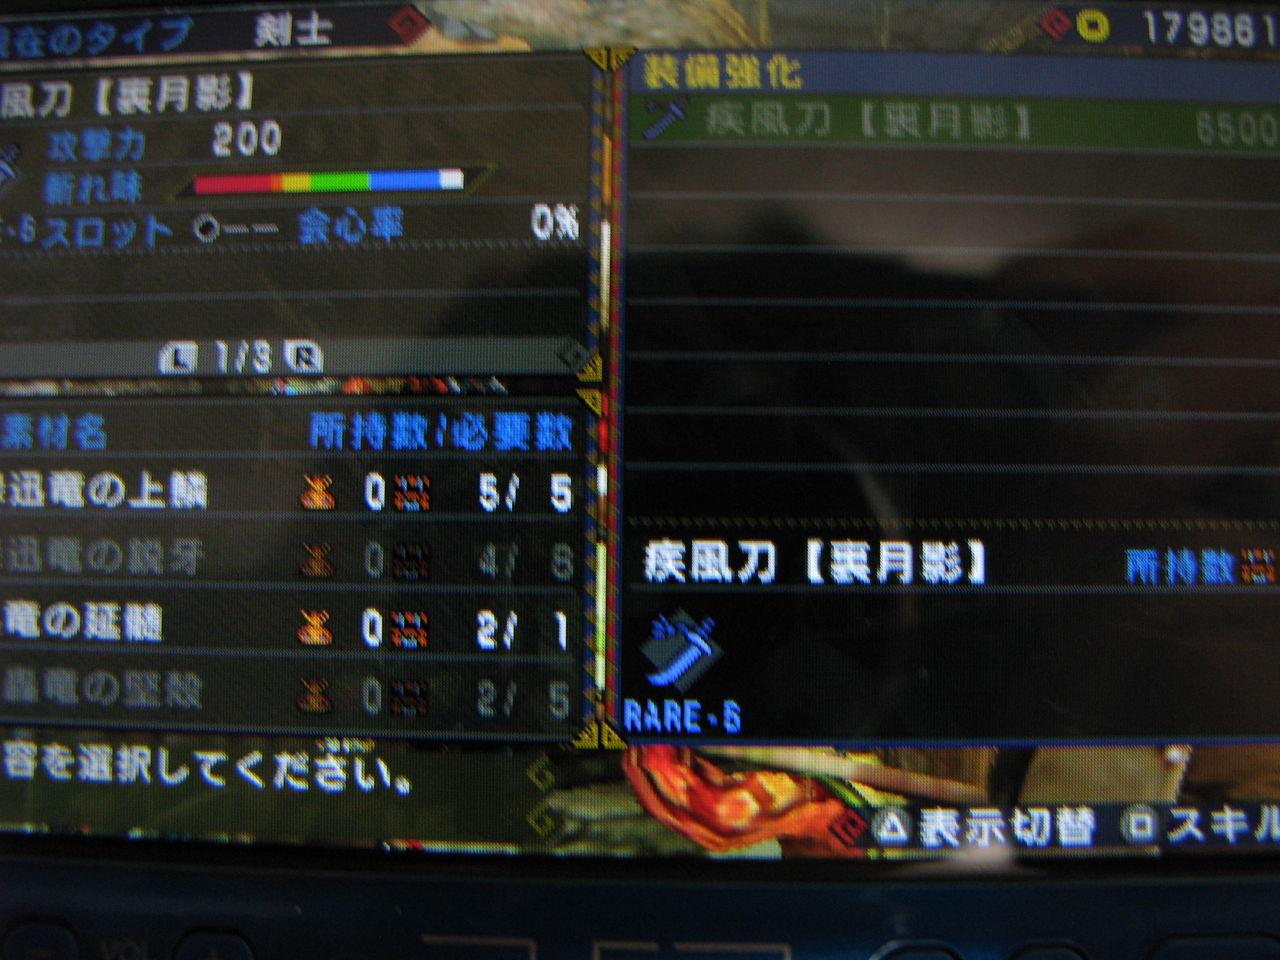 b8c97579.jpg